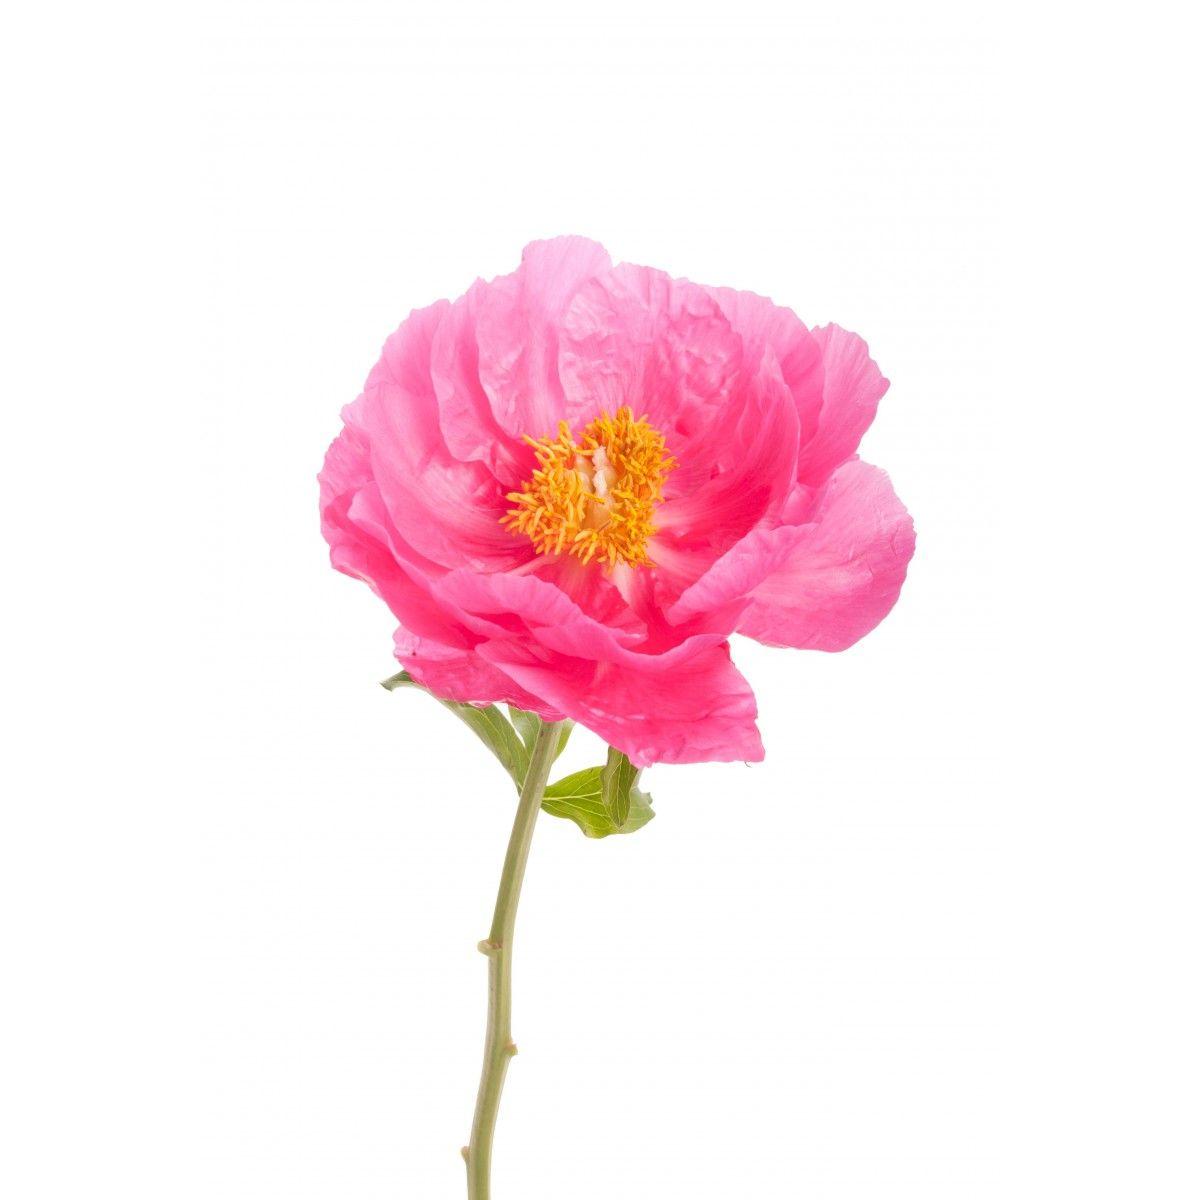 Hot Pink Single Bloom Peonies Home G A R D E N O U T D O O R